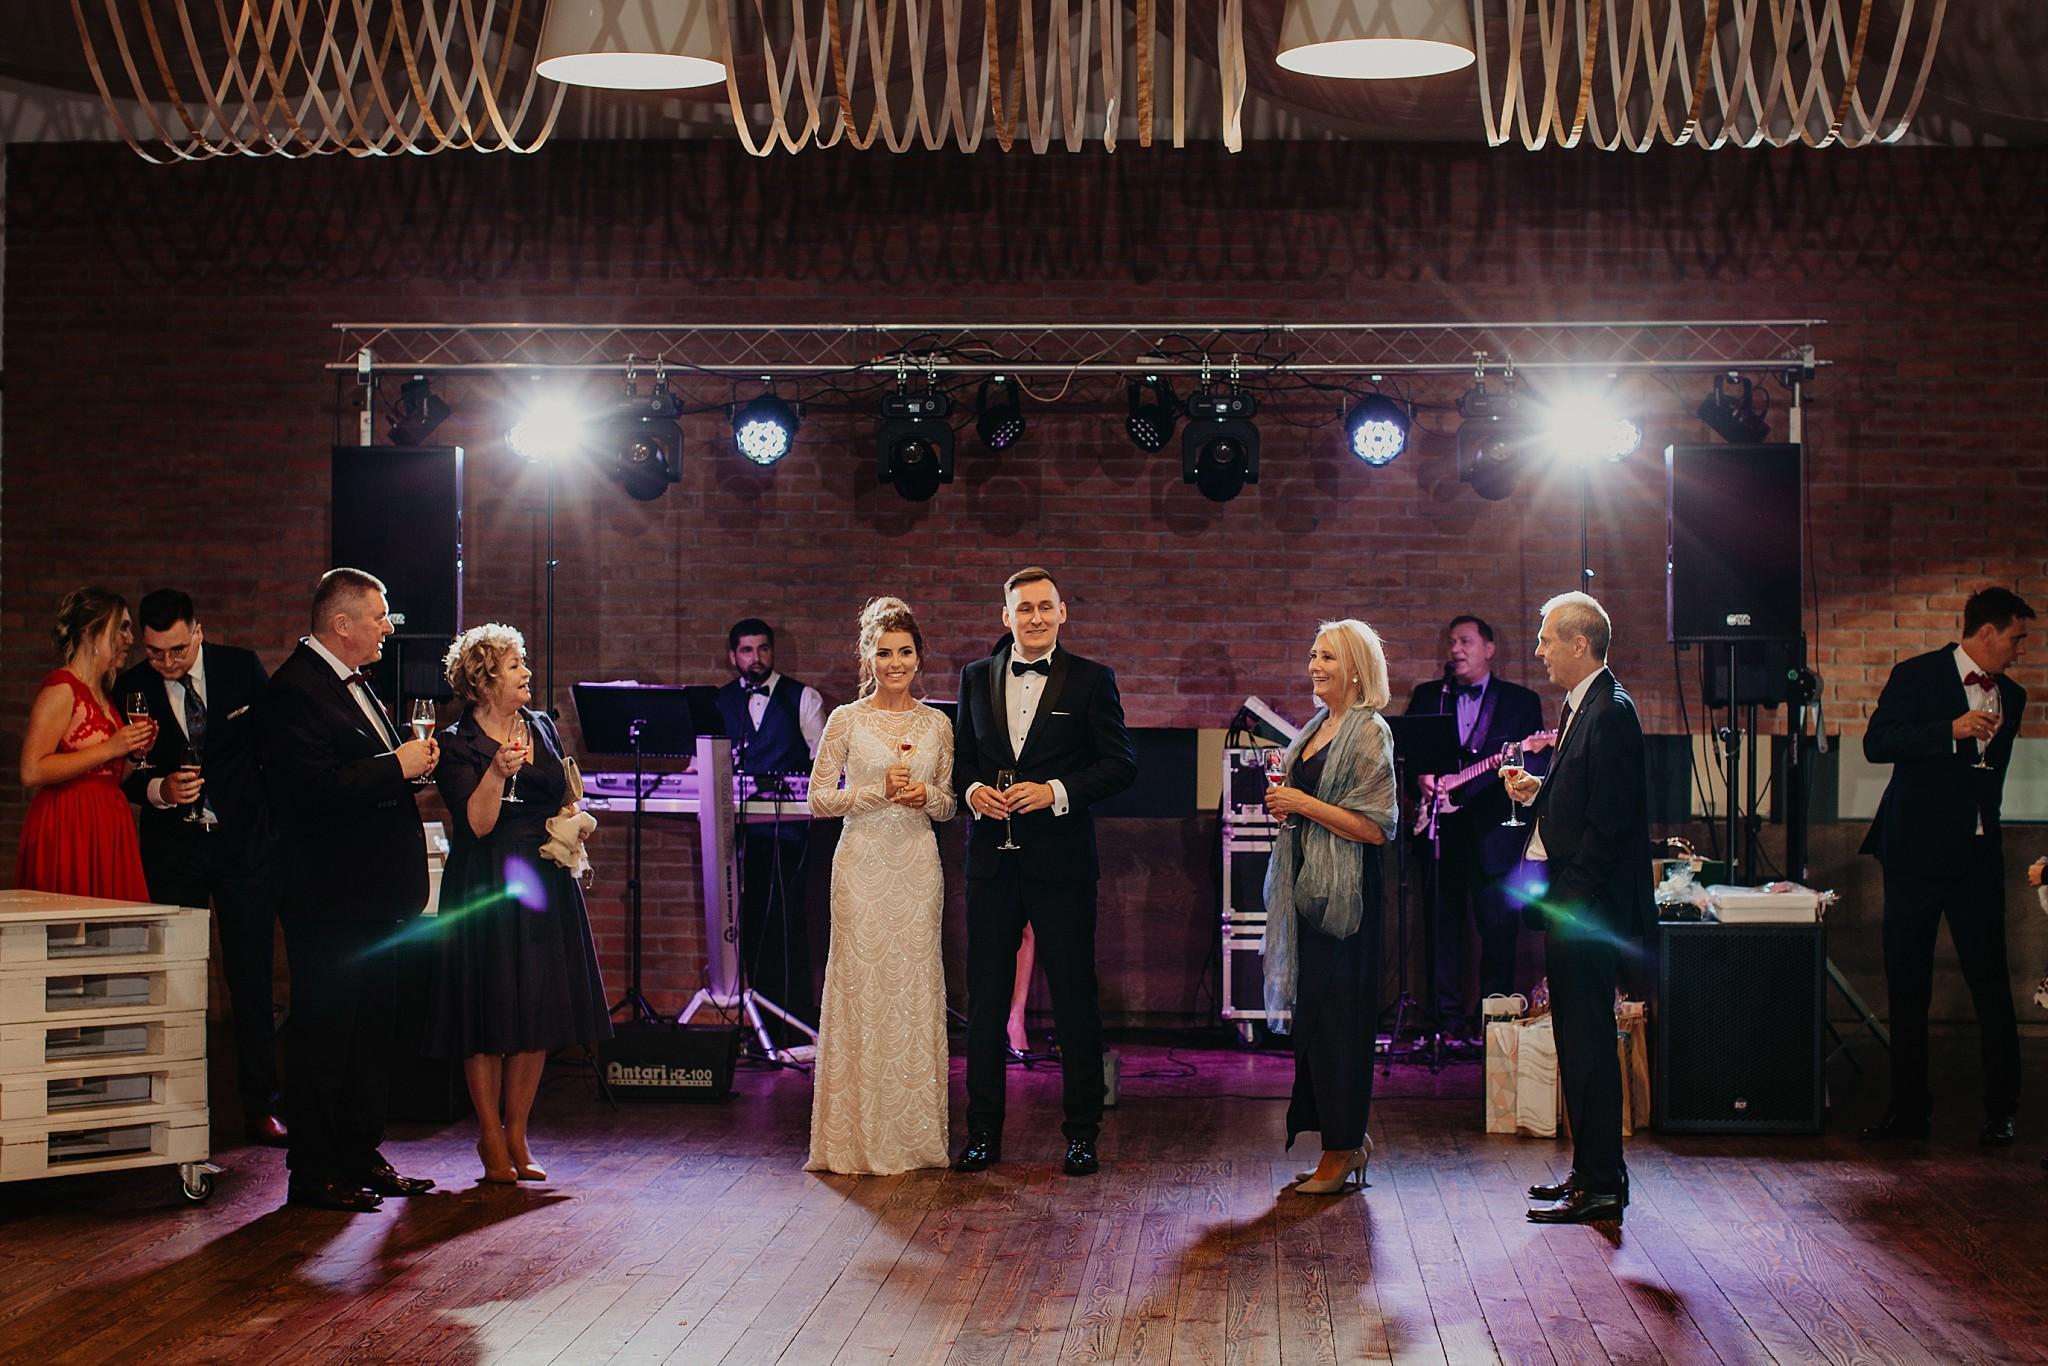 fotograf poznan wesele dobra truskawka piekne wesele pod poznaniem wesele w dobrej truskawce piekna para mloda slub marzen slub koronawirus slub listopad wesele koronawirus 293